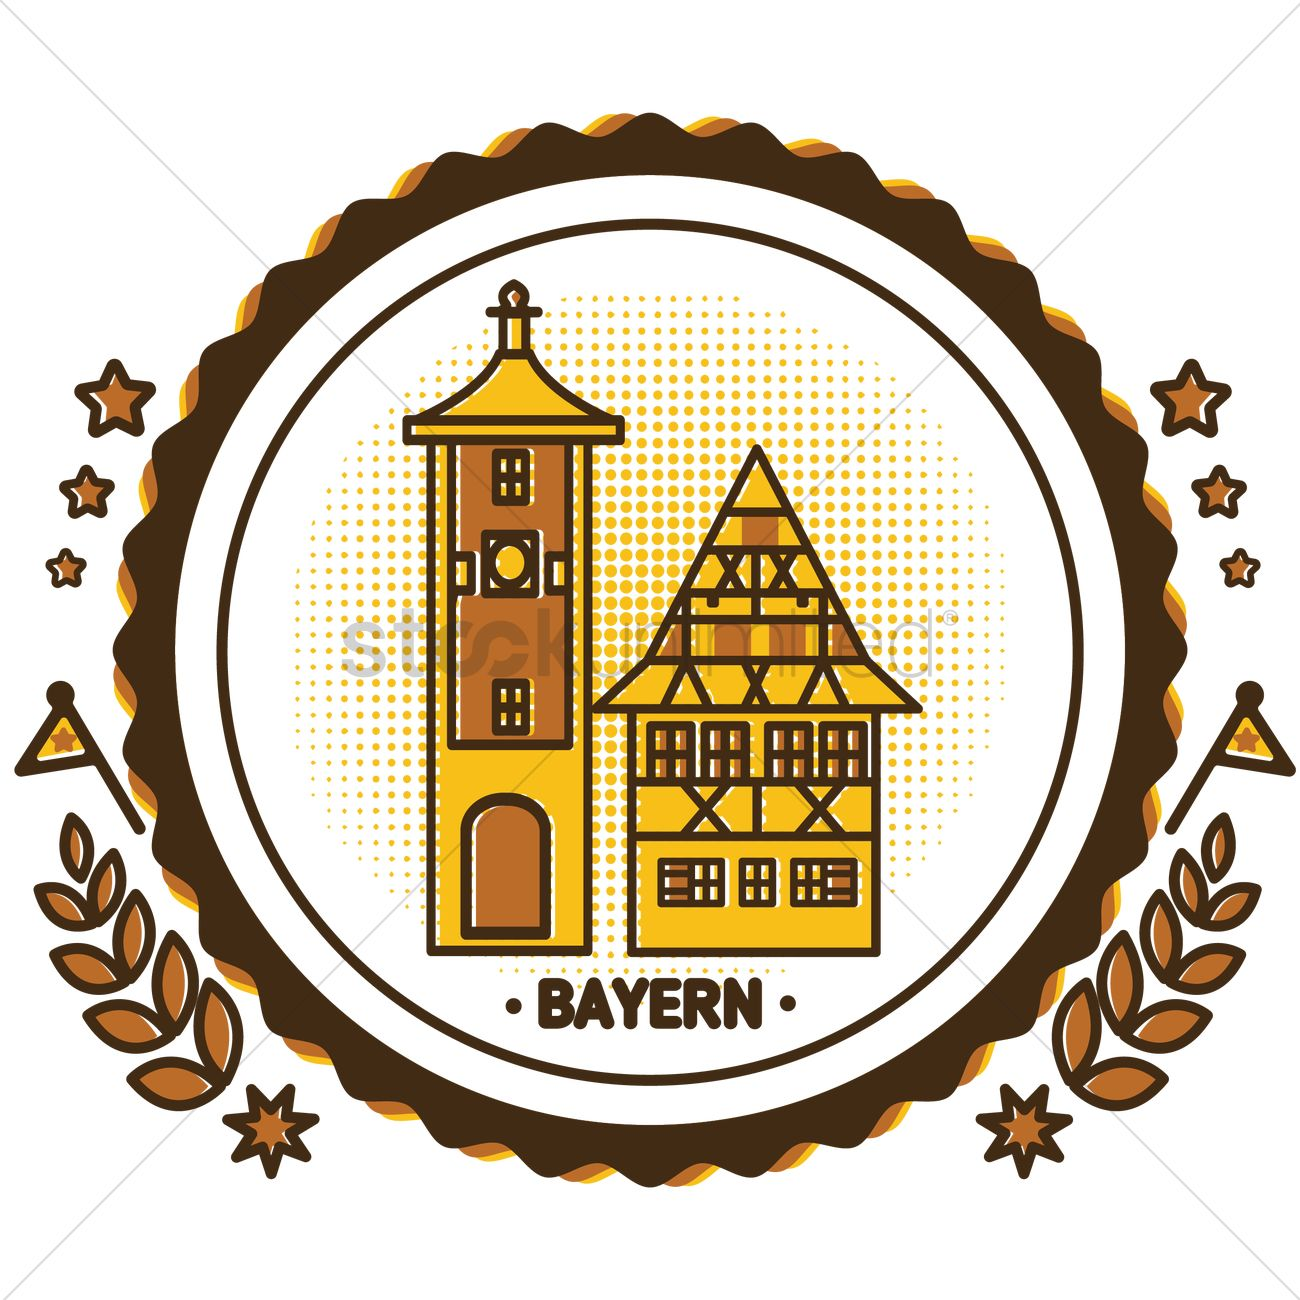 Bayern munich town hall Vector Image.